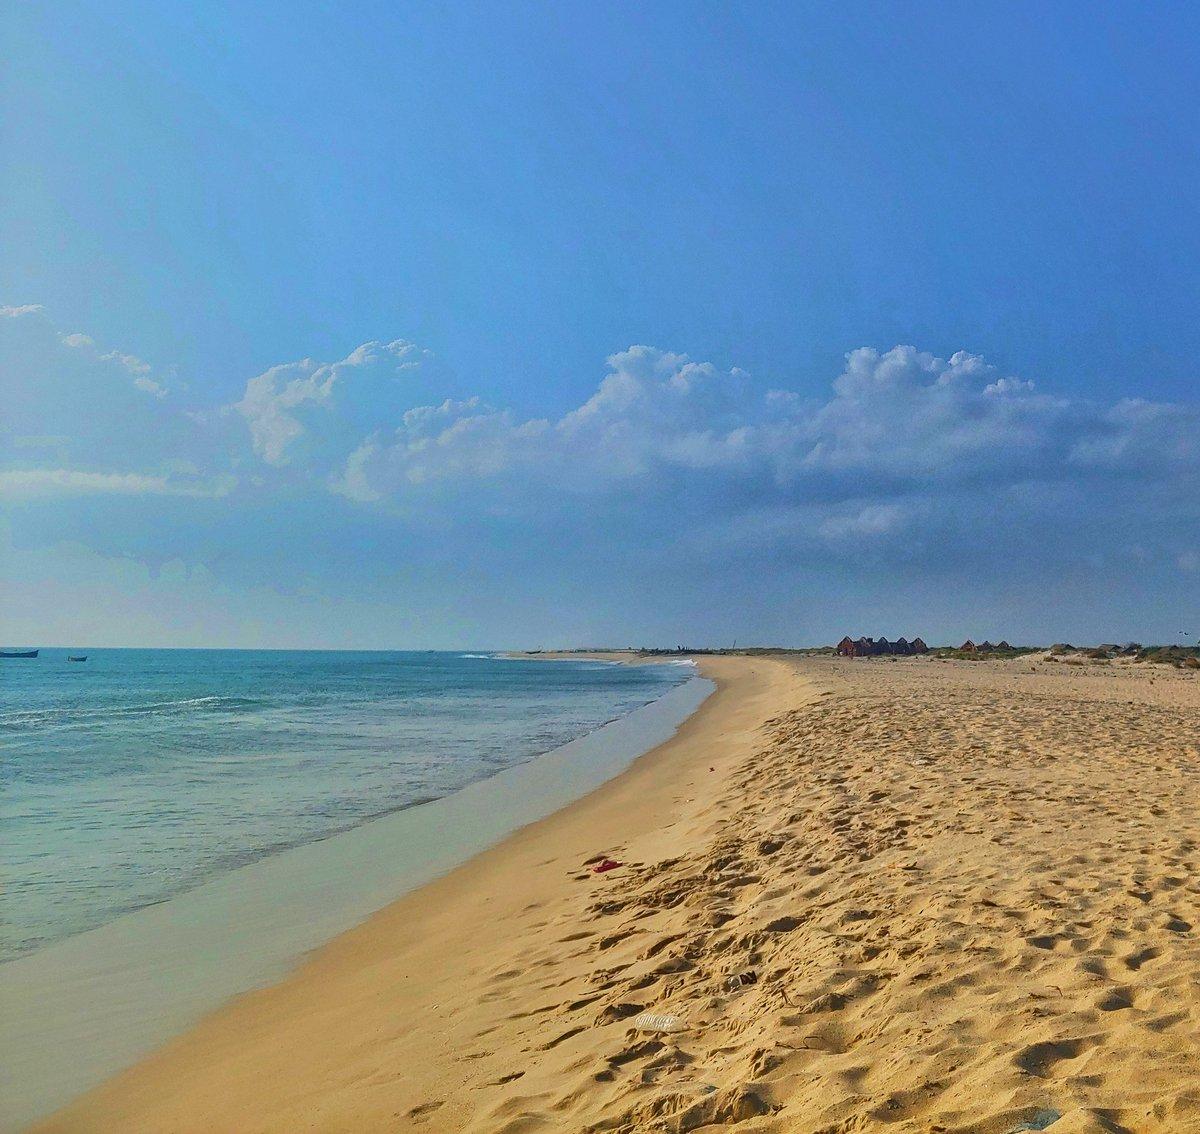 Beach Diaries . #picoftheday #photooftheday #traveldiaries #naturephotography #landscape #travelblogger #ThursdayThoughts #thursdayvibes #thursdaymorning #photography #photographer #traveler #nature #photography #tamilnadu #india #travelers #travel #travelblog #travelphotography https://t.co/vjrHJHR4NW